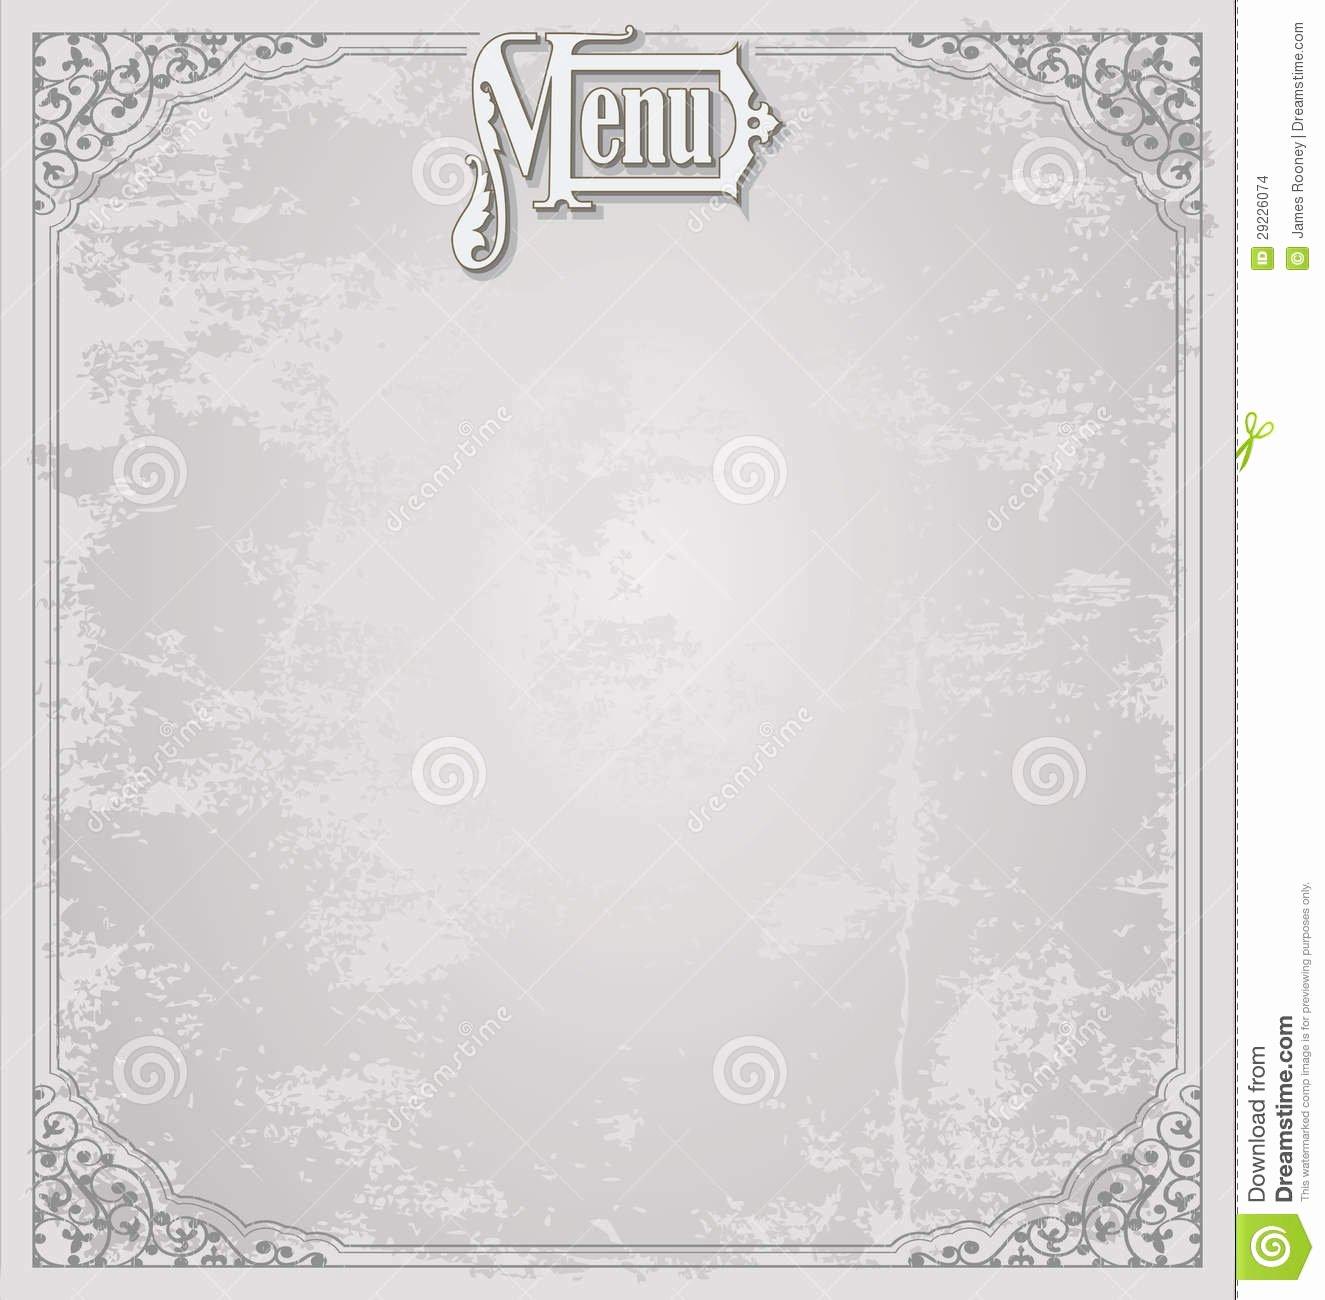 Blank Menu Template Free Lovely Menu Design Template Stock Illustration Illustration Of